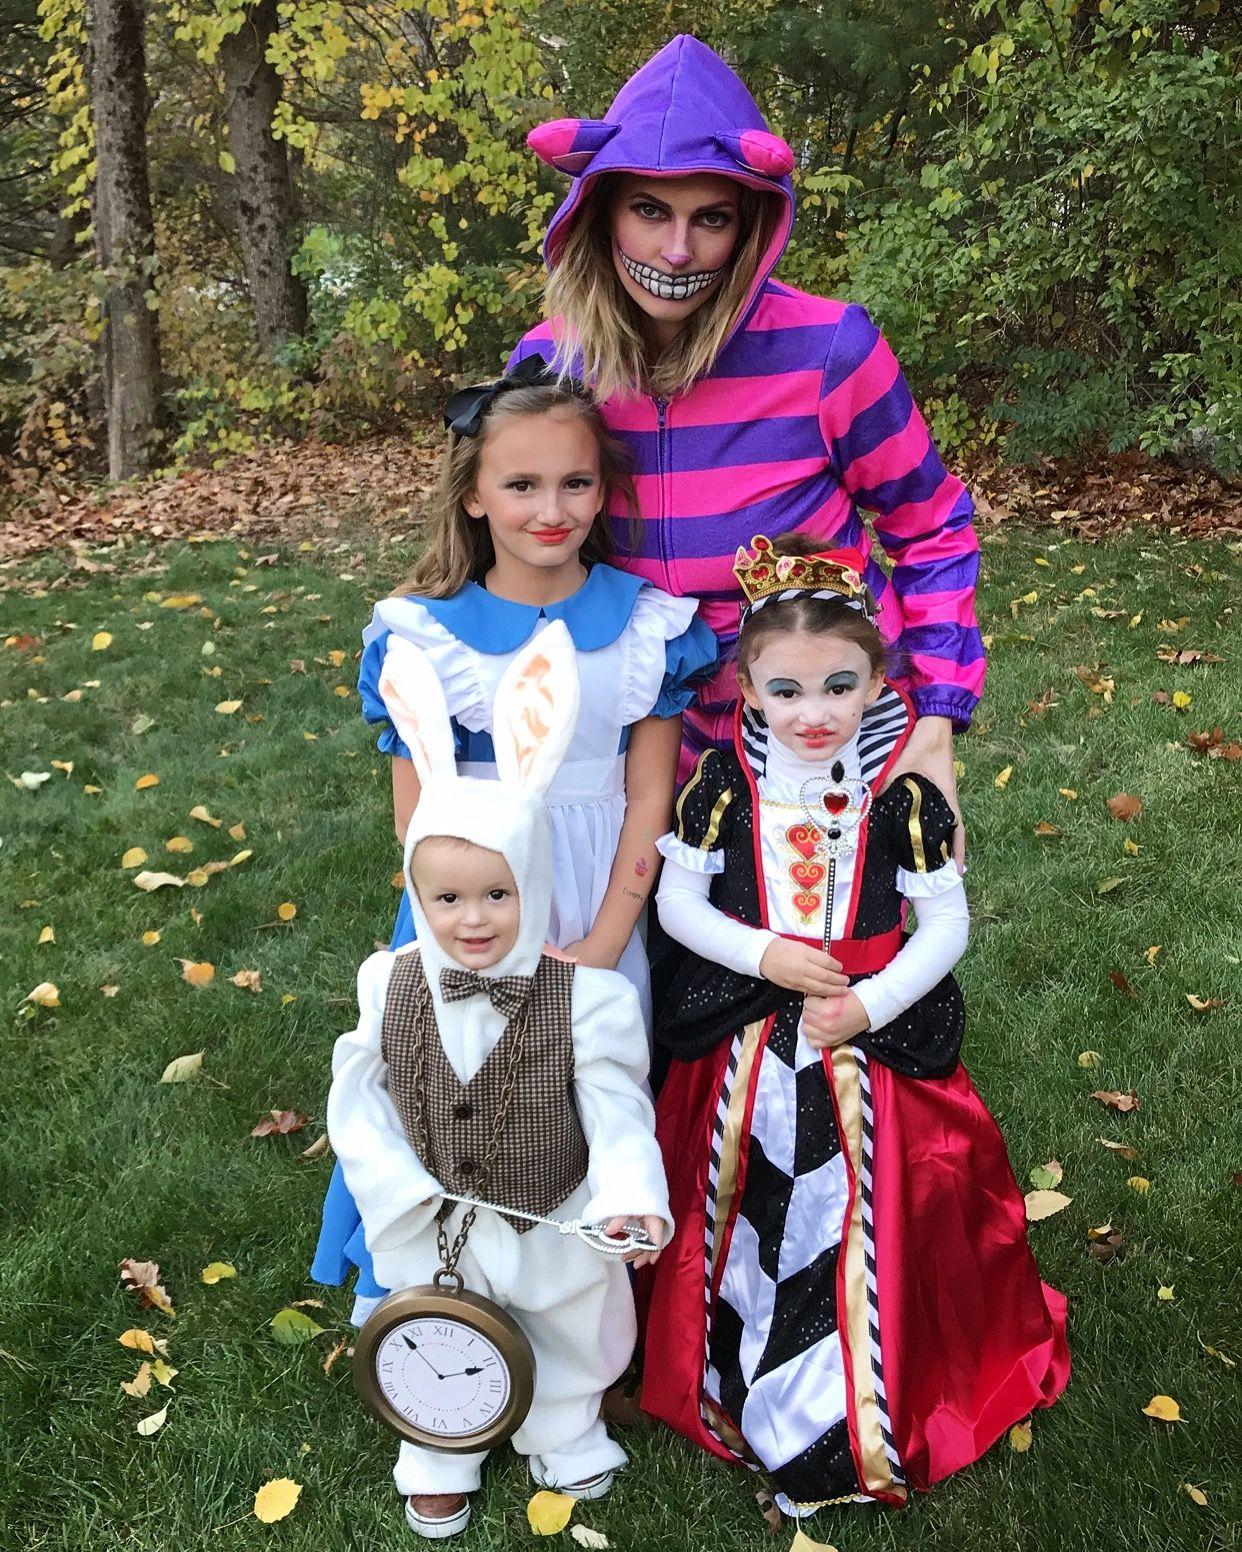 Alice In Wonderland Halloween Costume Family.Family In Wonderland Family Halloween Costumes Alice In Wonderland